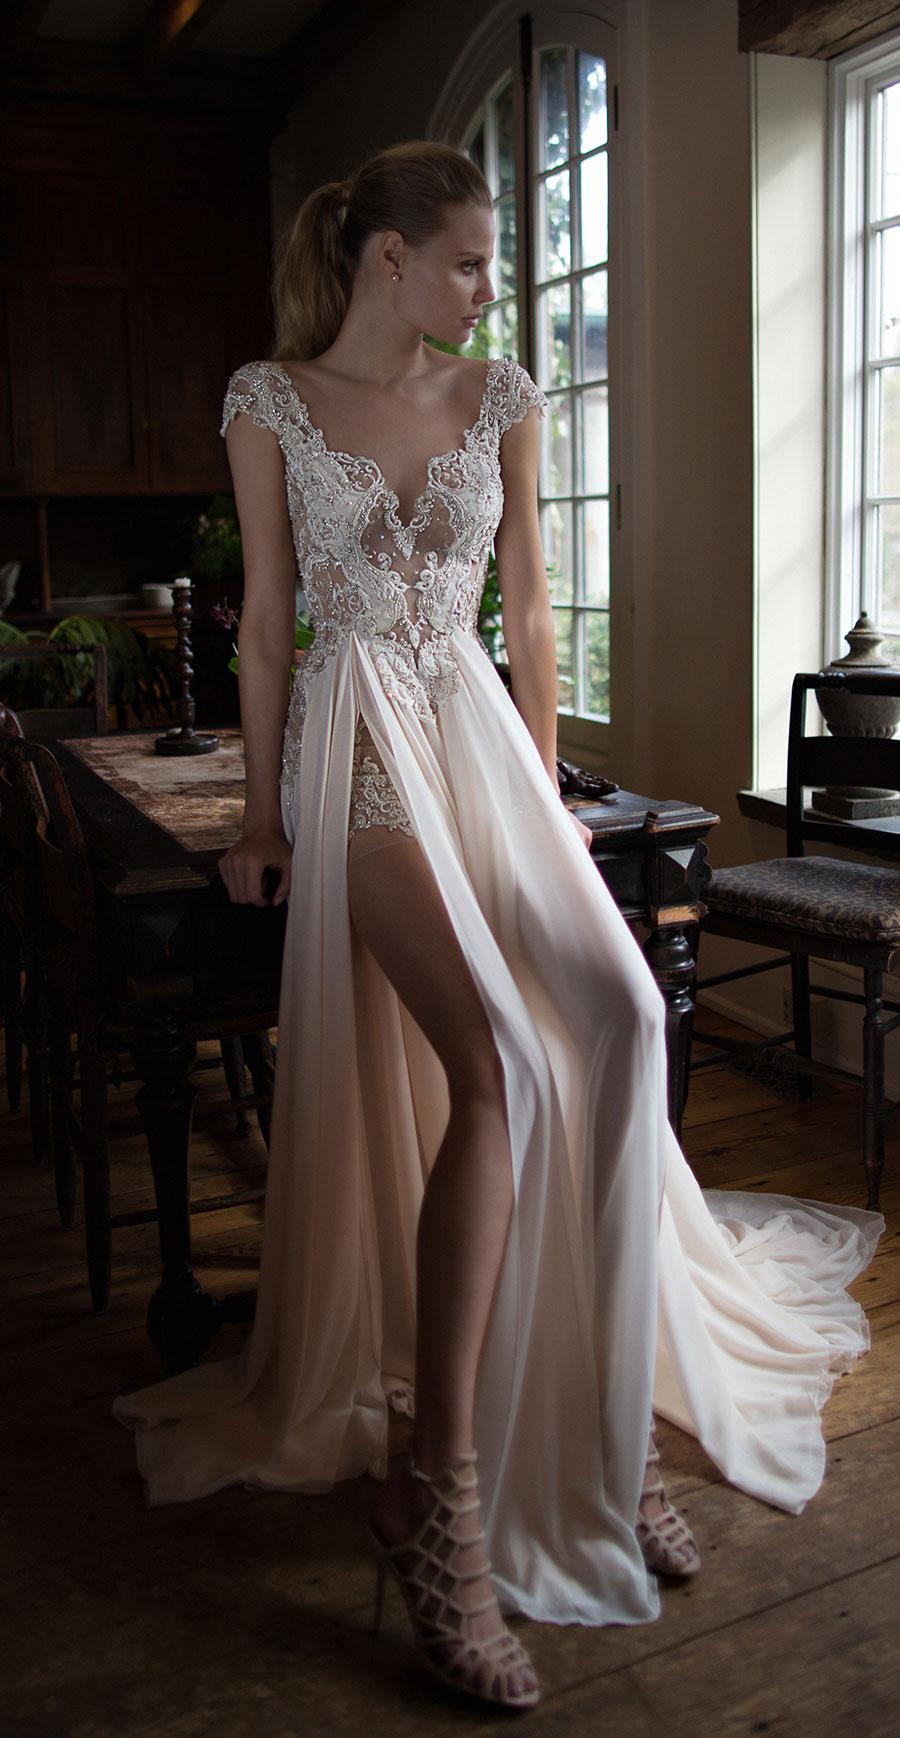 Berta-Bridal-Wedding-Dresses-Fall-Winter-2016-Bridal-Collection-00027